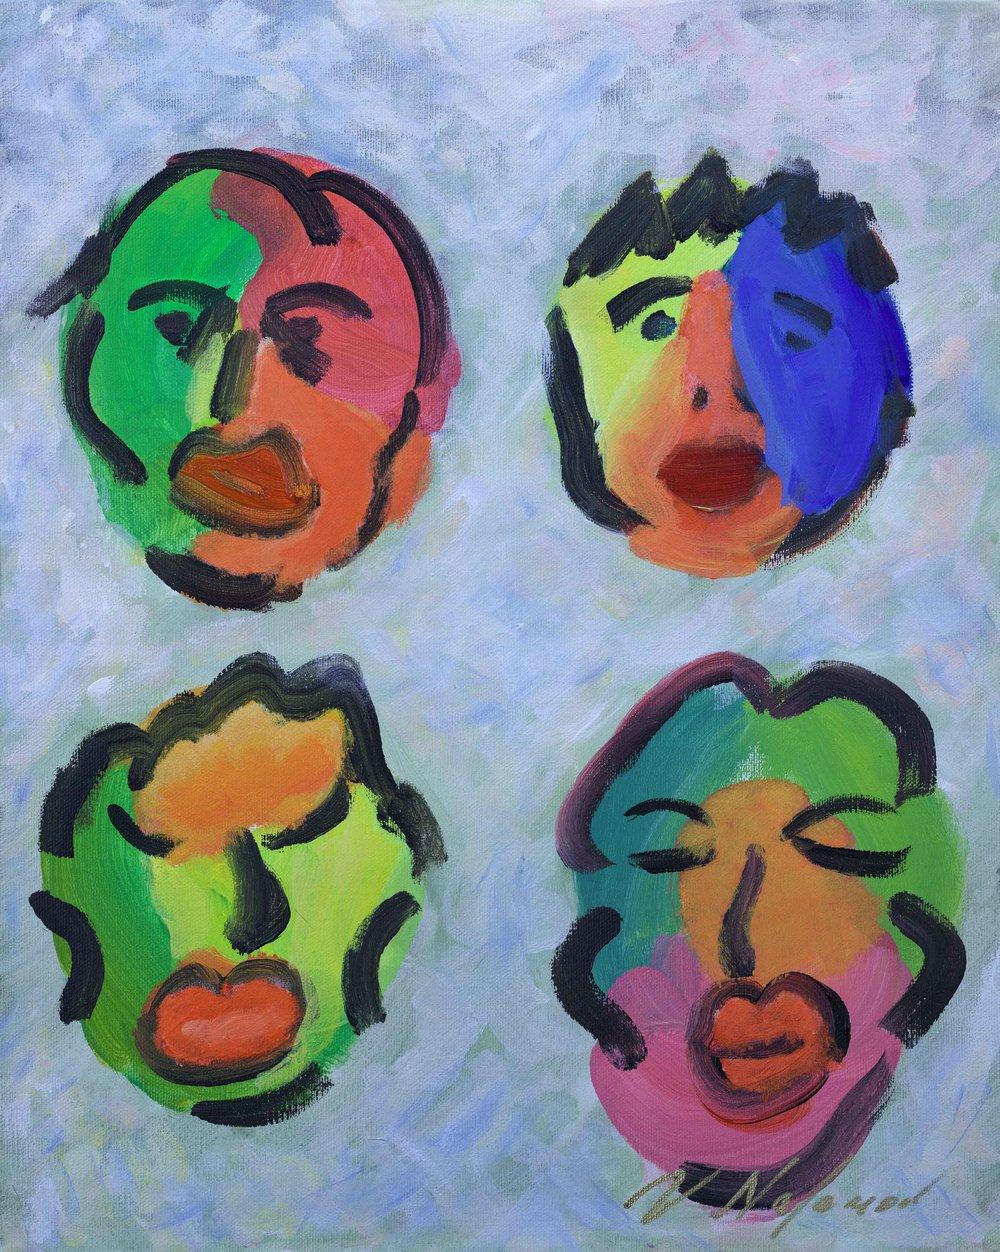 Faces #3